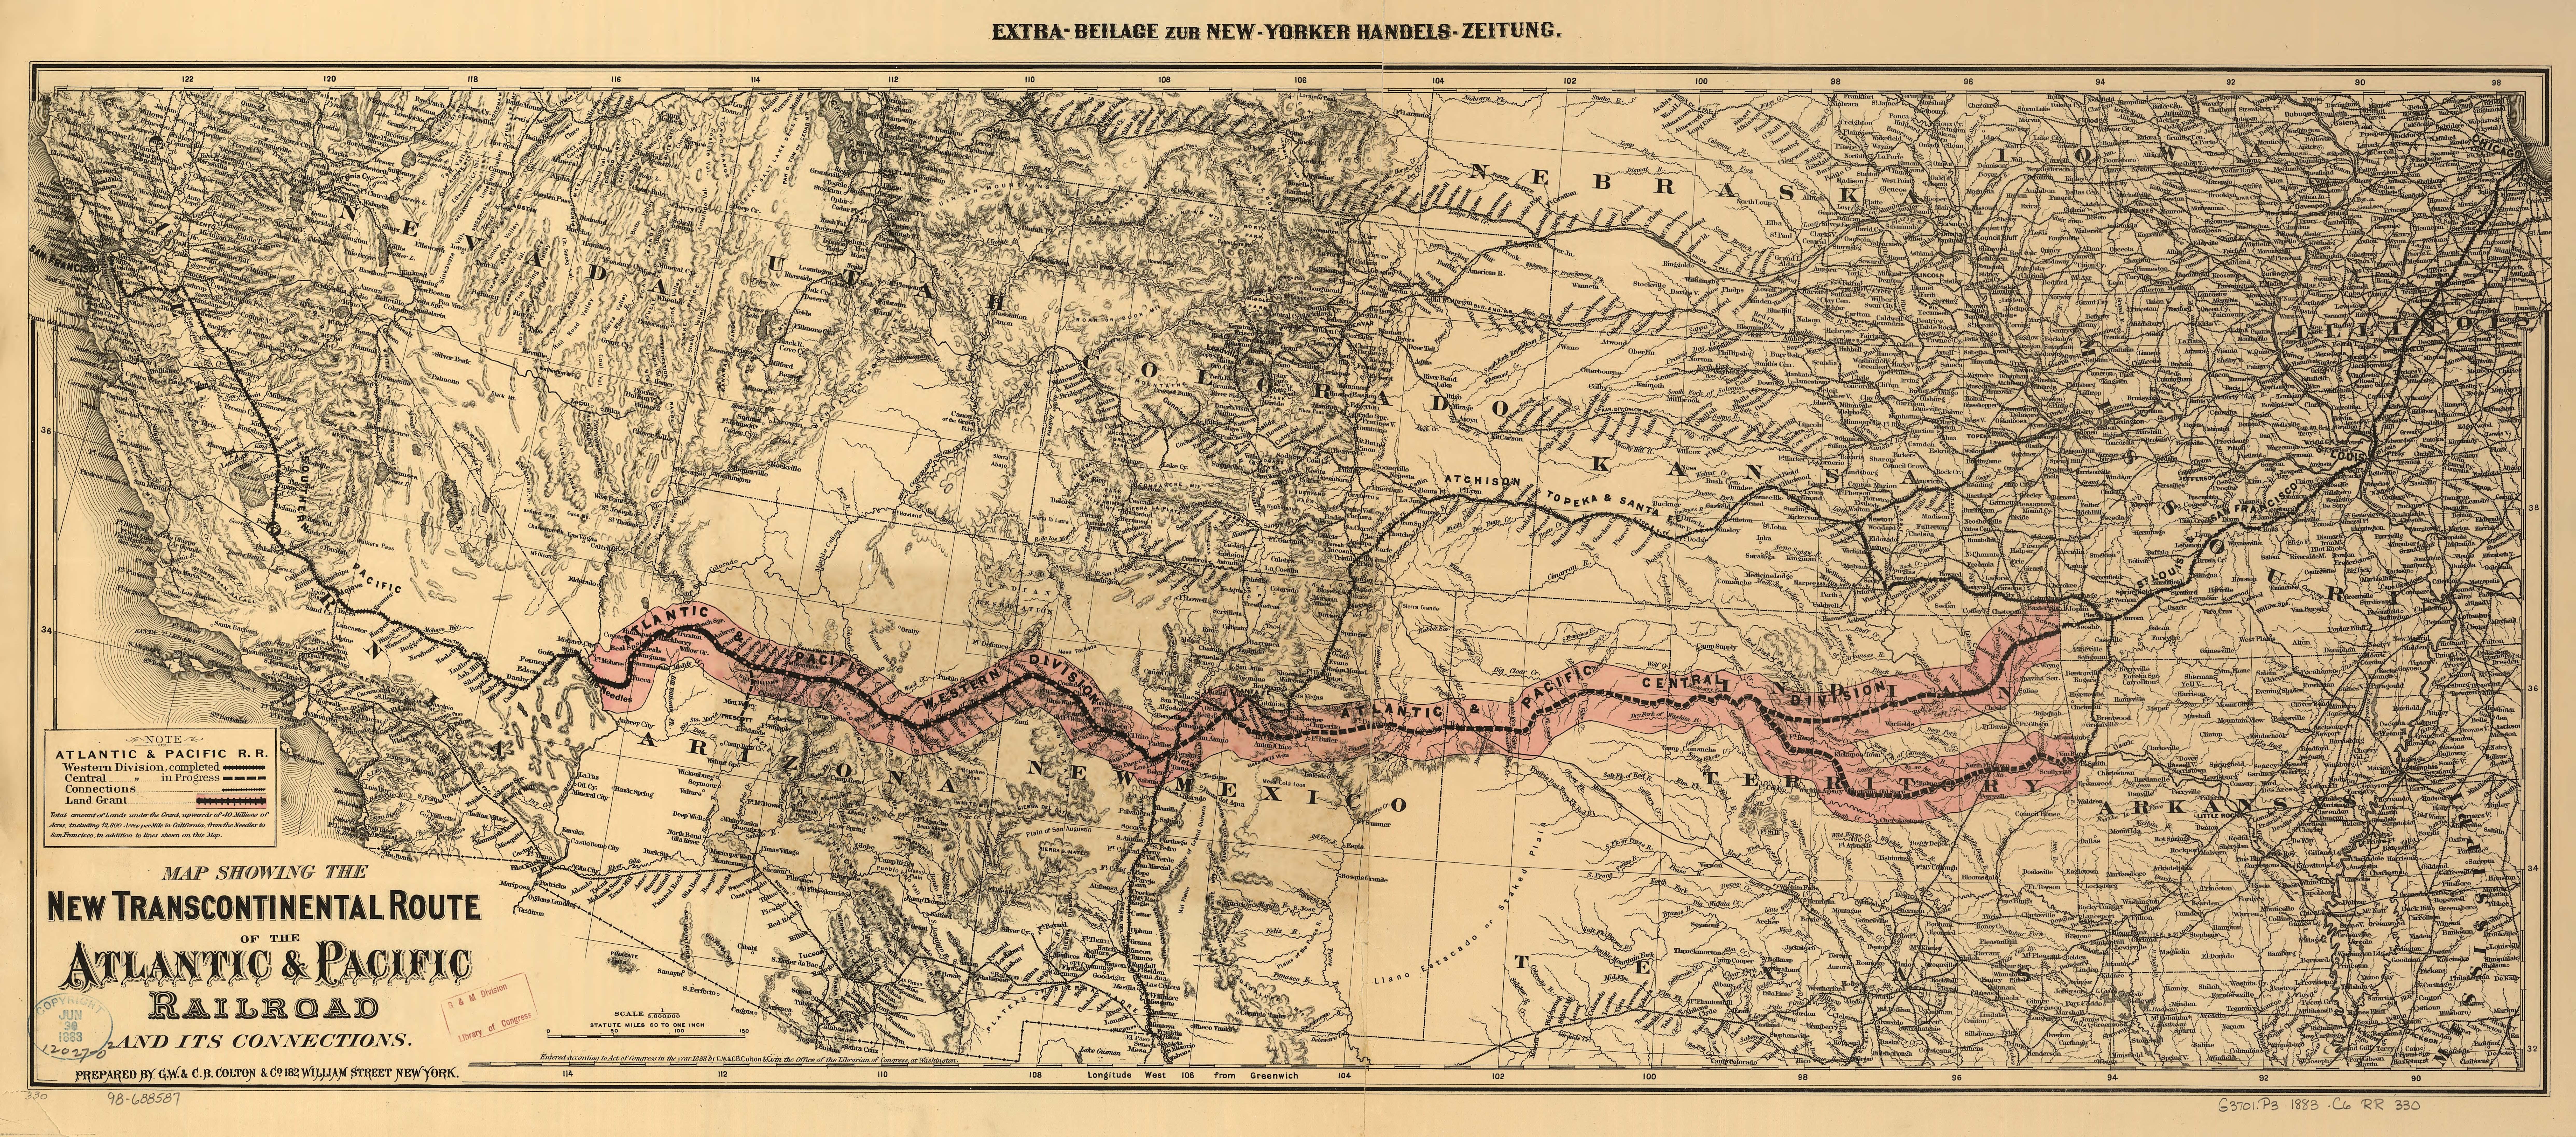 Atlantic Pacific Railroad Map Train Travel In The S - 1889 us railroad map